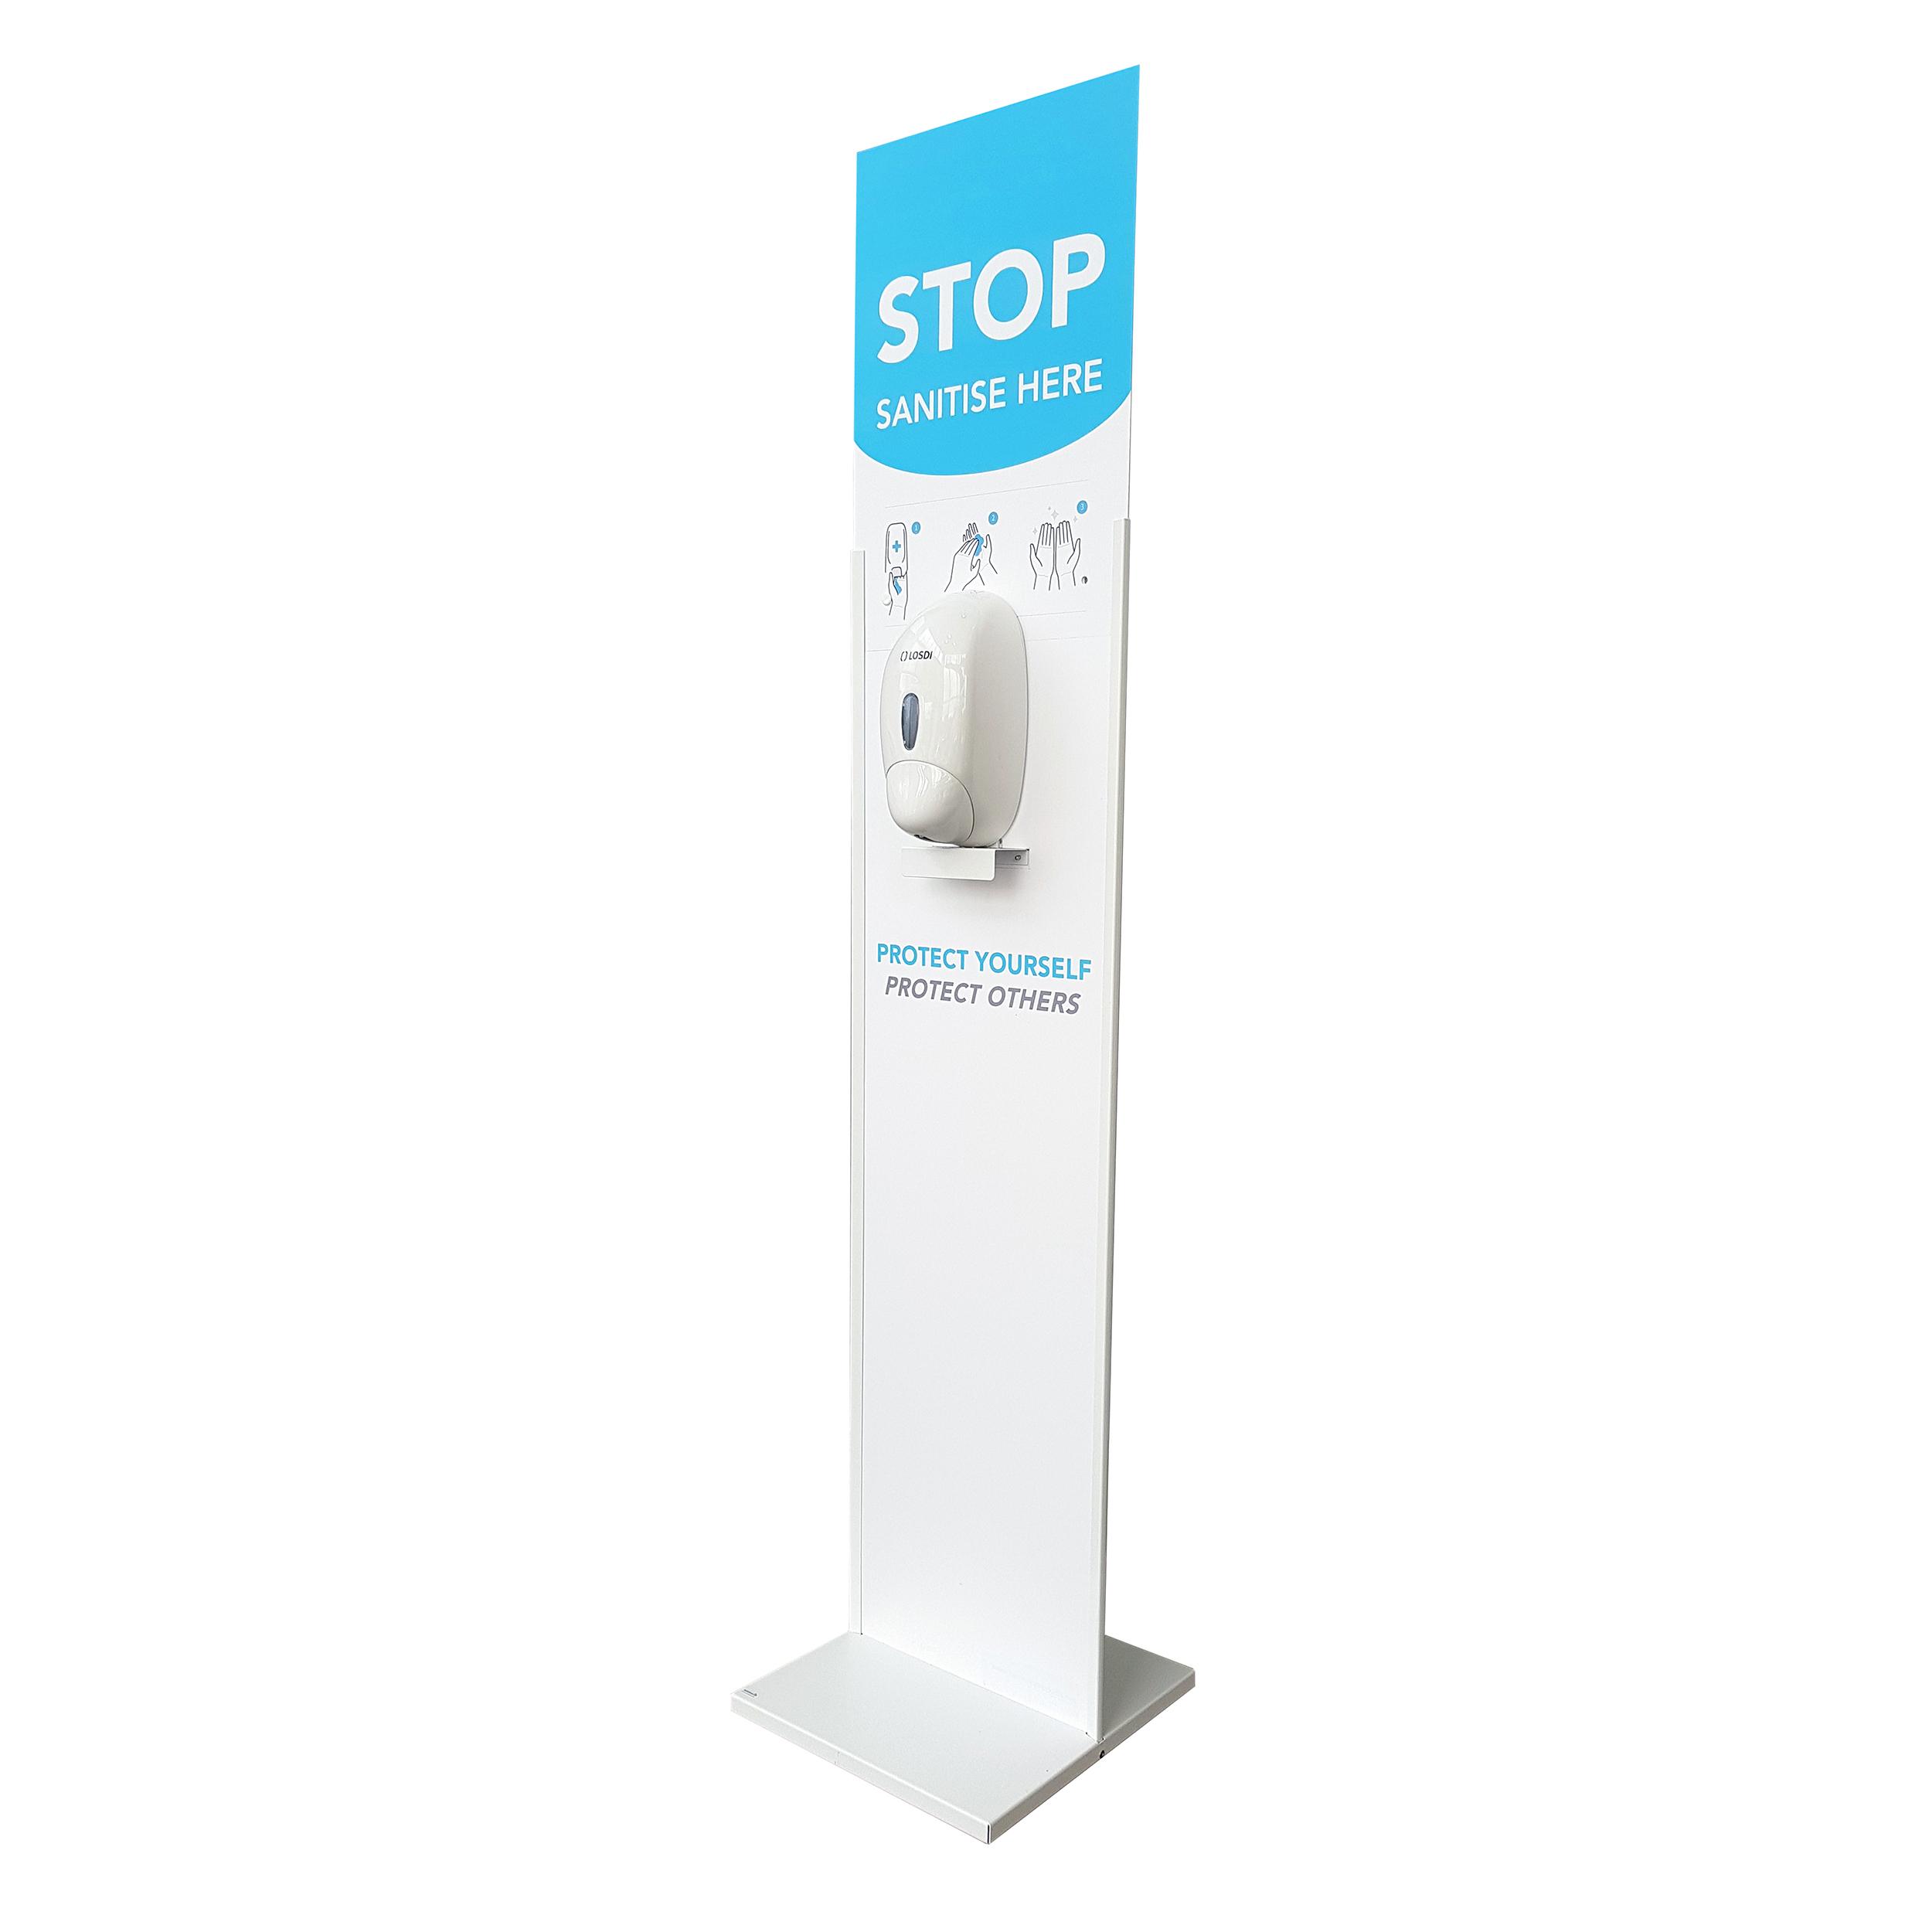 Institutional soap or lotion dispensers Floor Standing Hand Sanitiser Unit